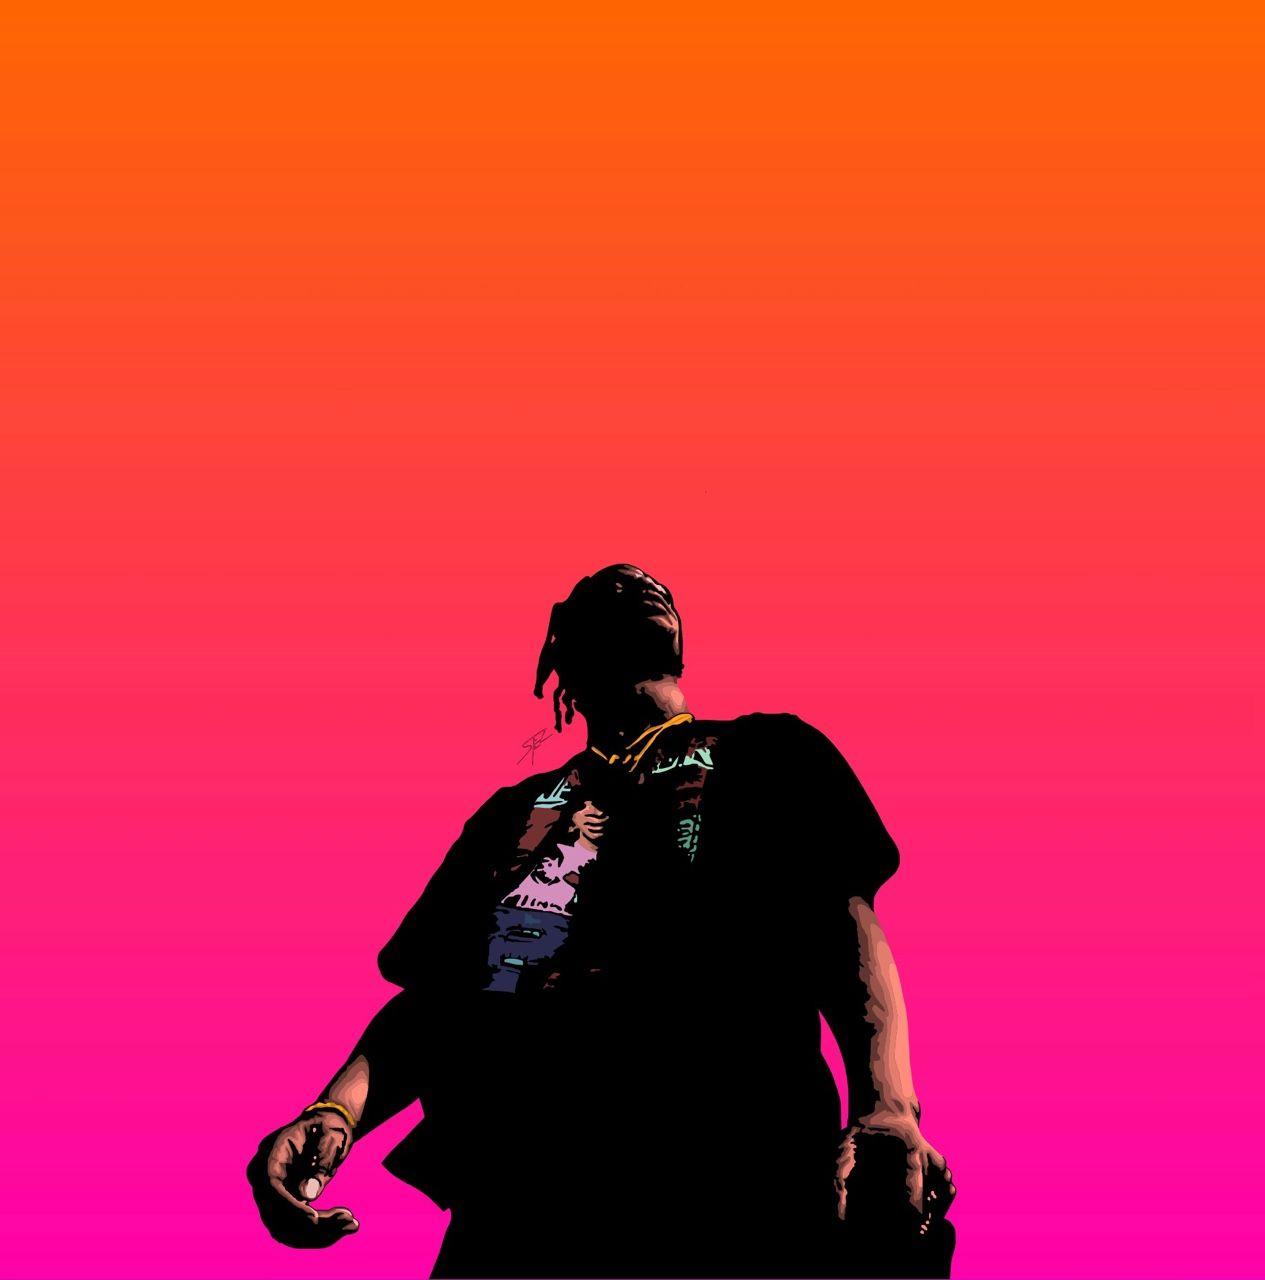 Travis Scott Travis Scott Live Travis Scott Rapper Wallpaper Iphone